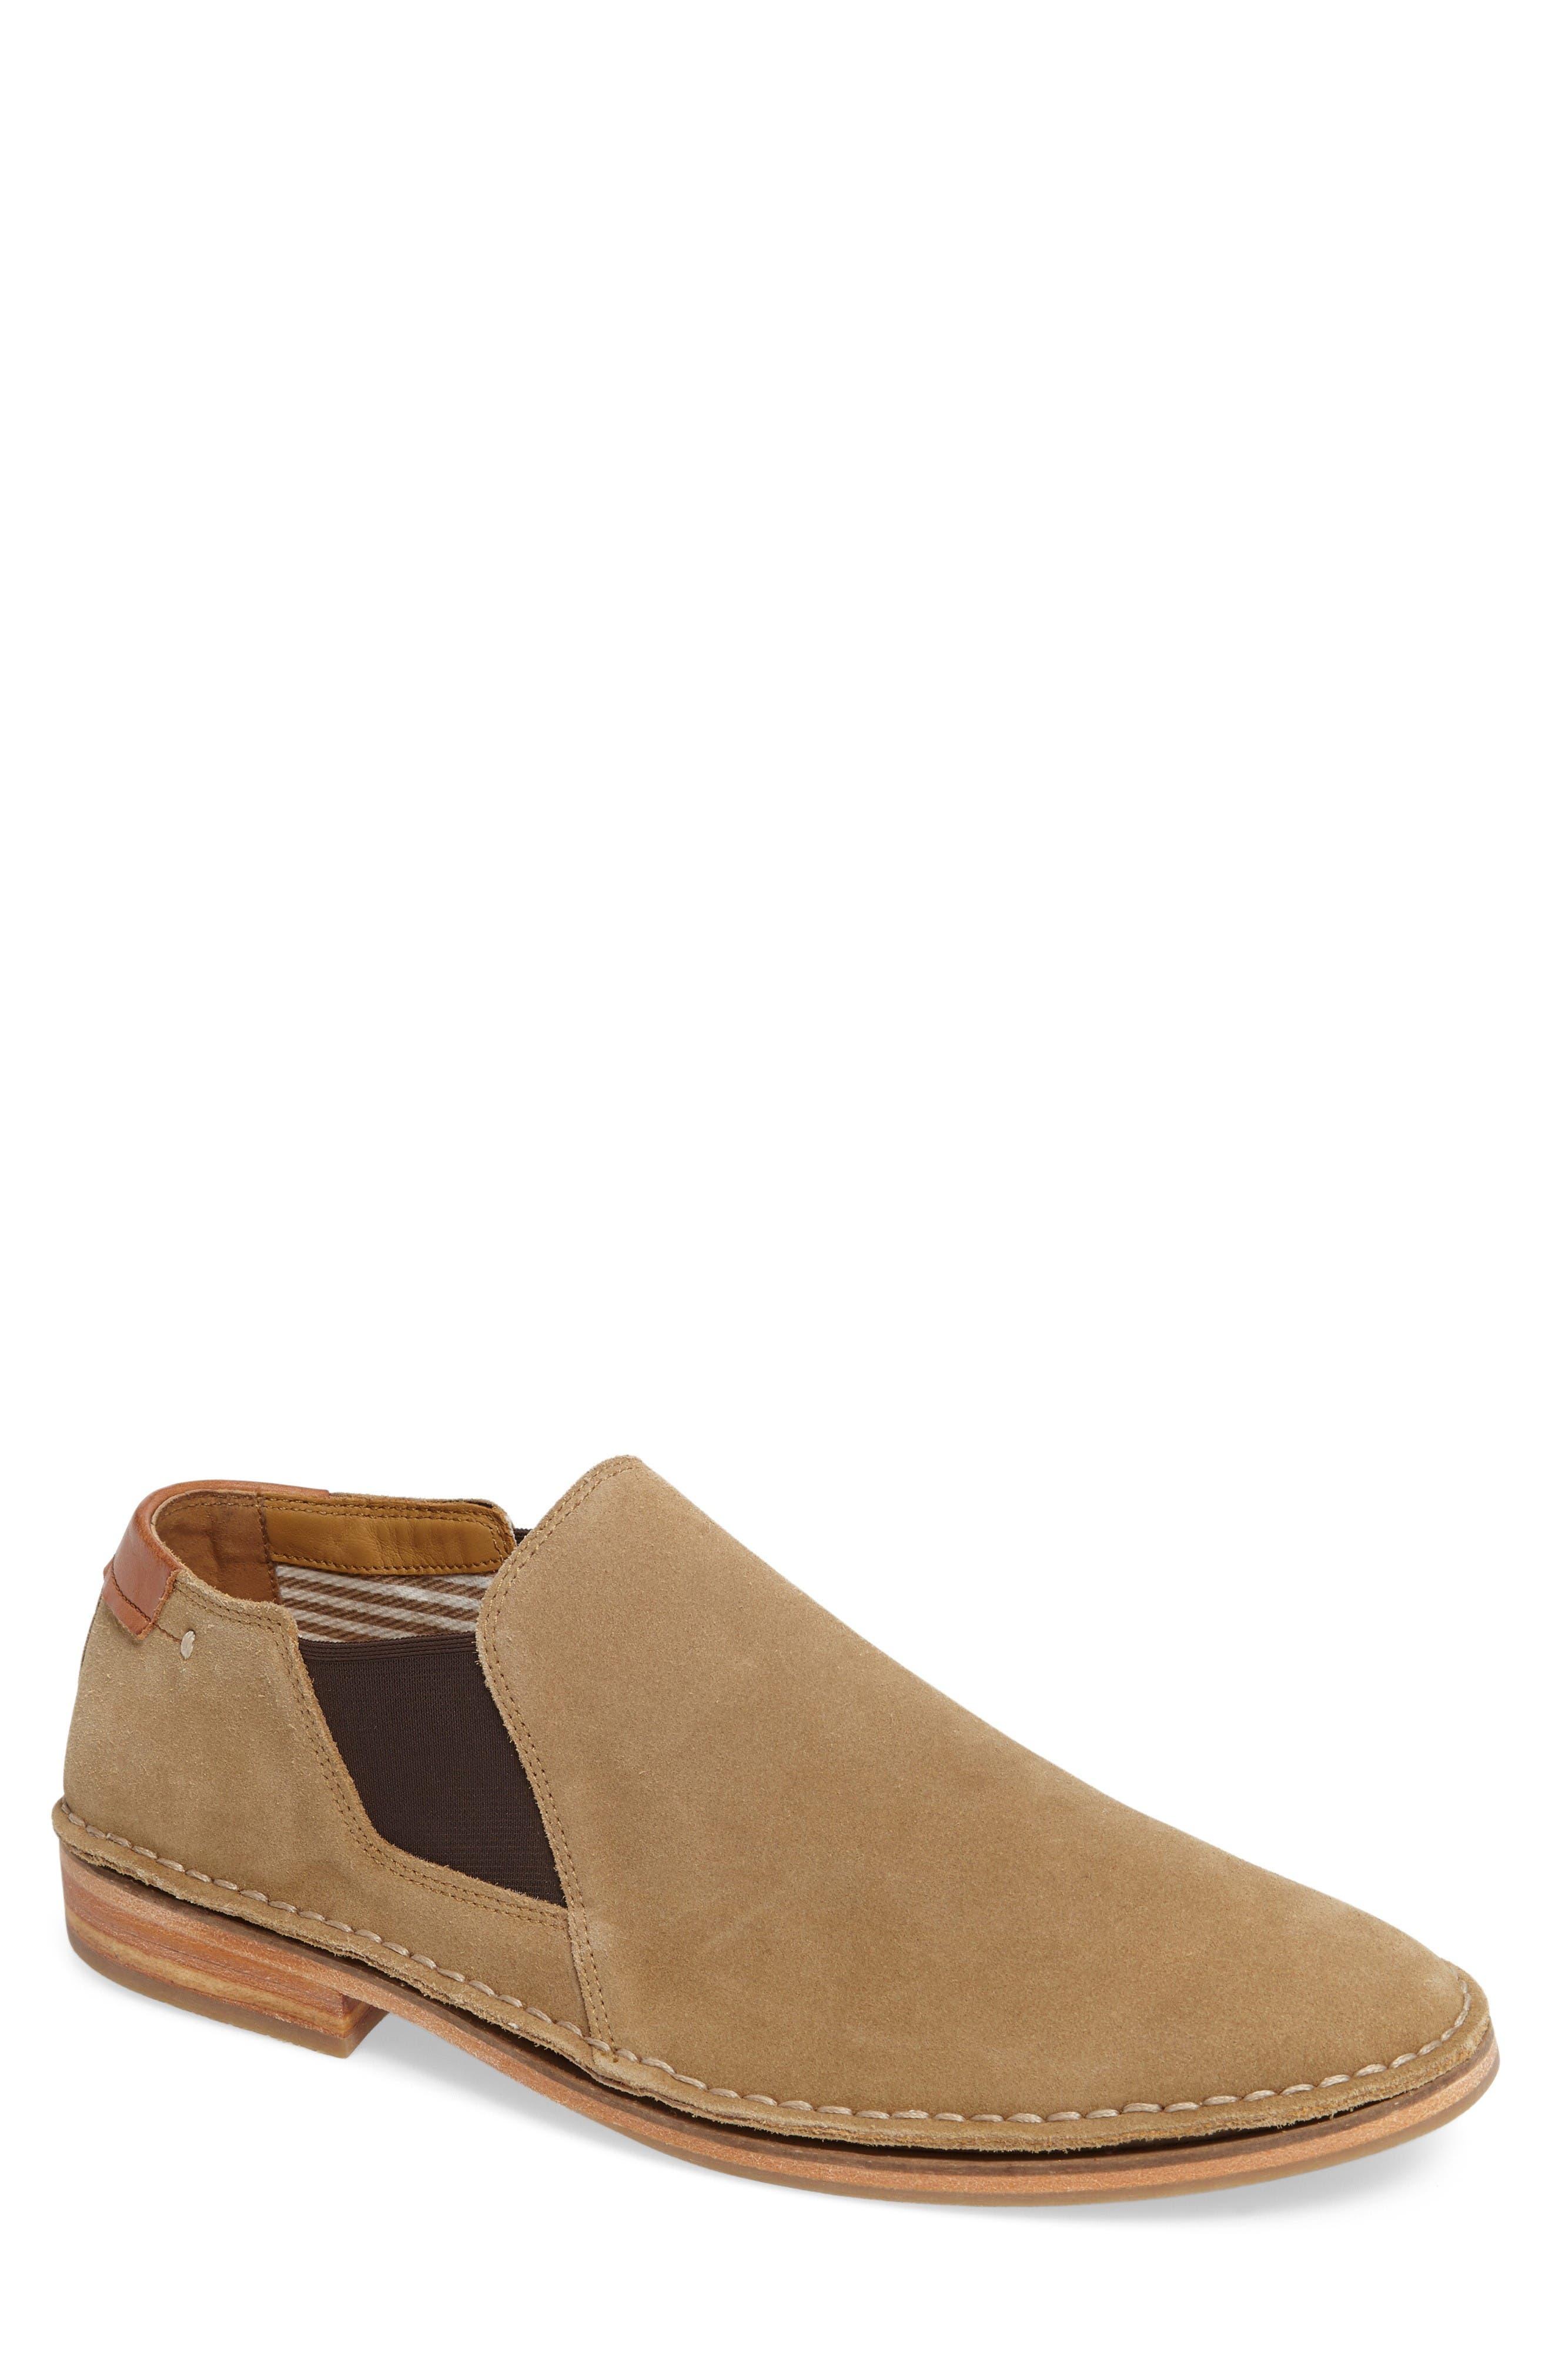 Hunters Chelsea Boot,                         Main,                         color, Studland